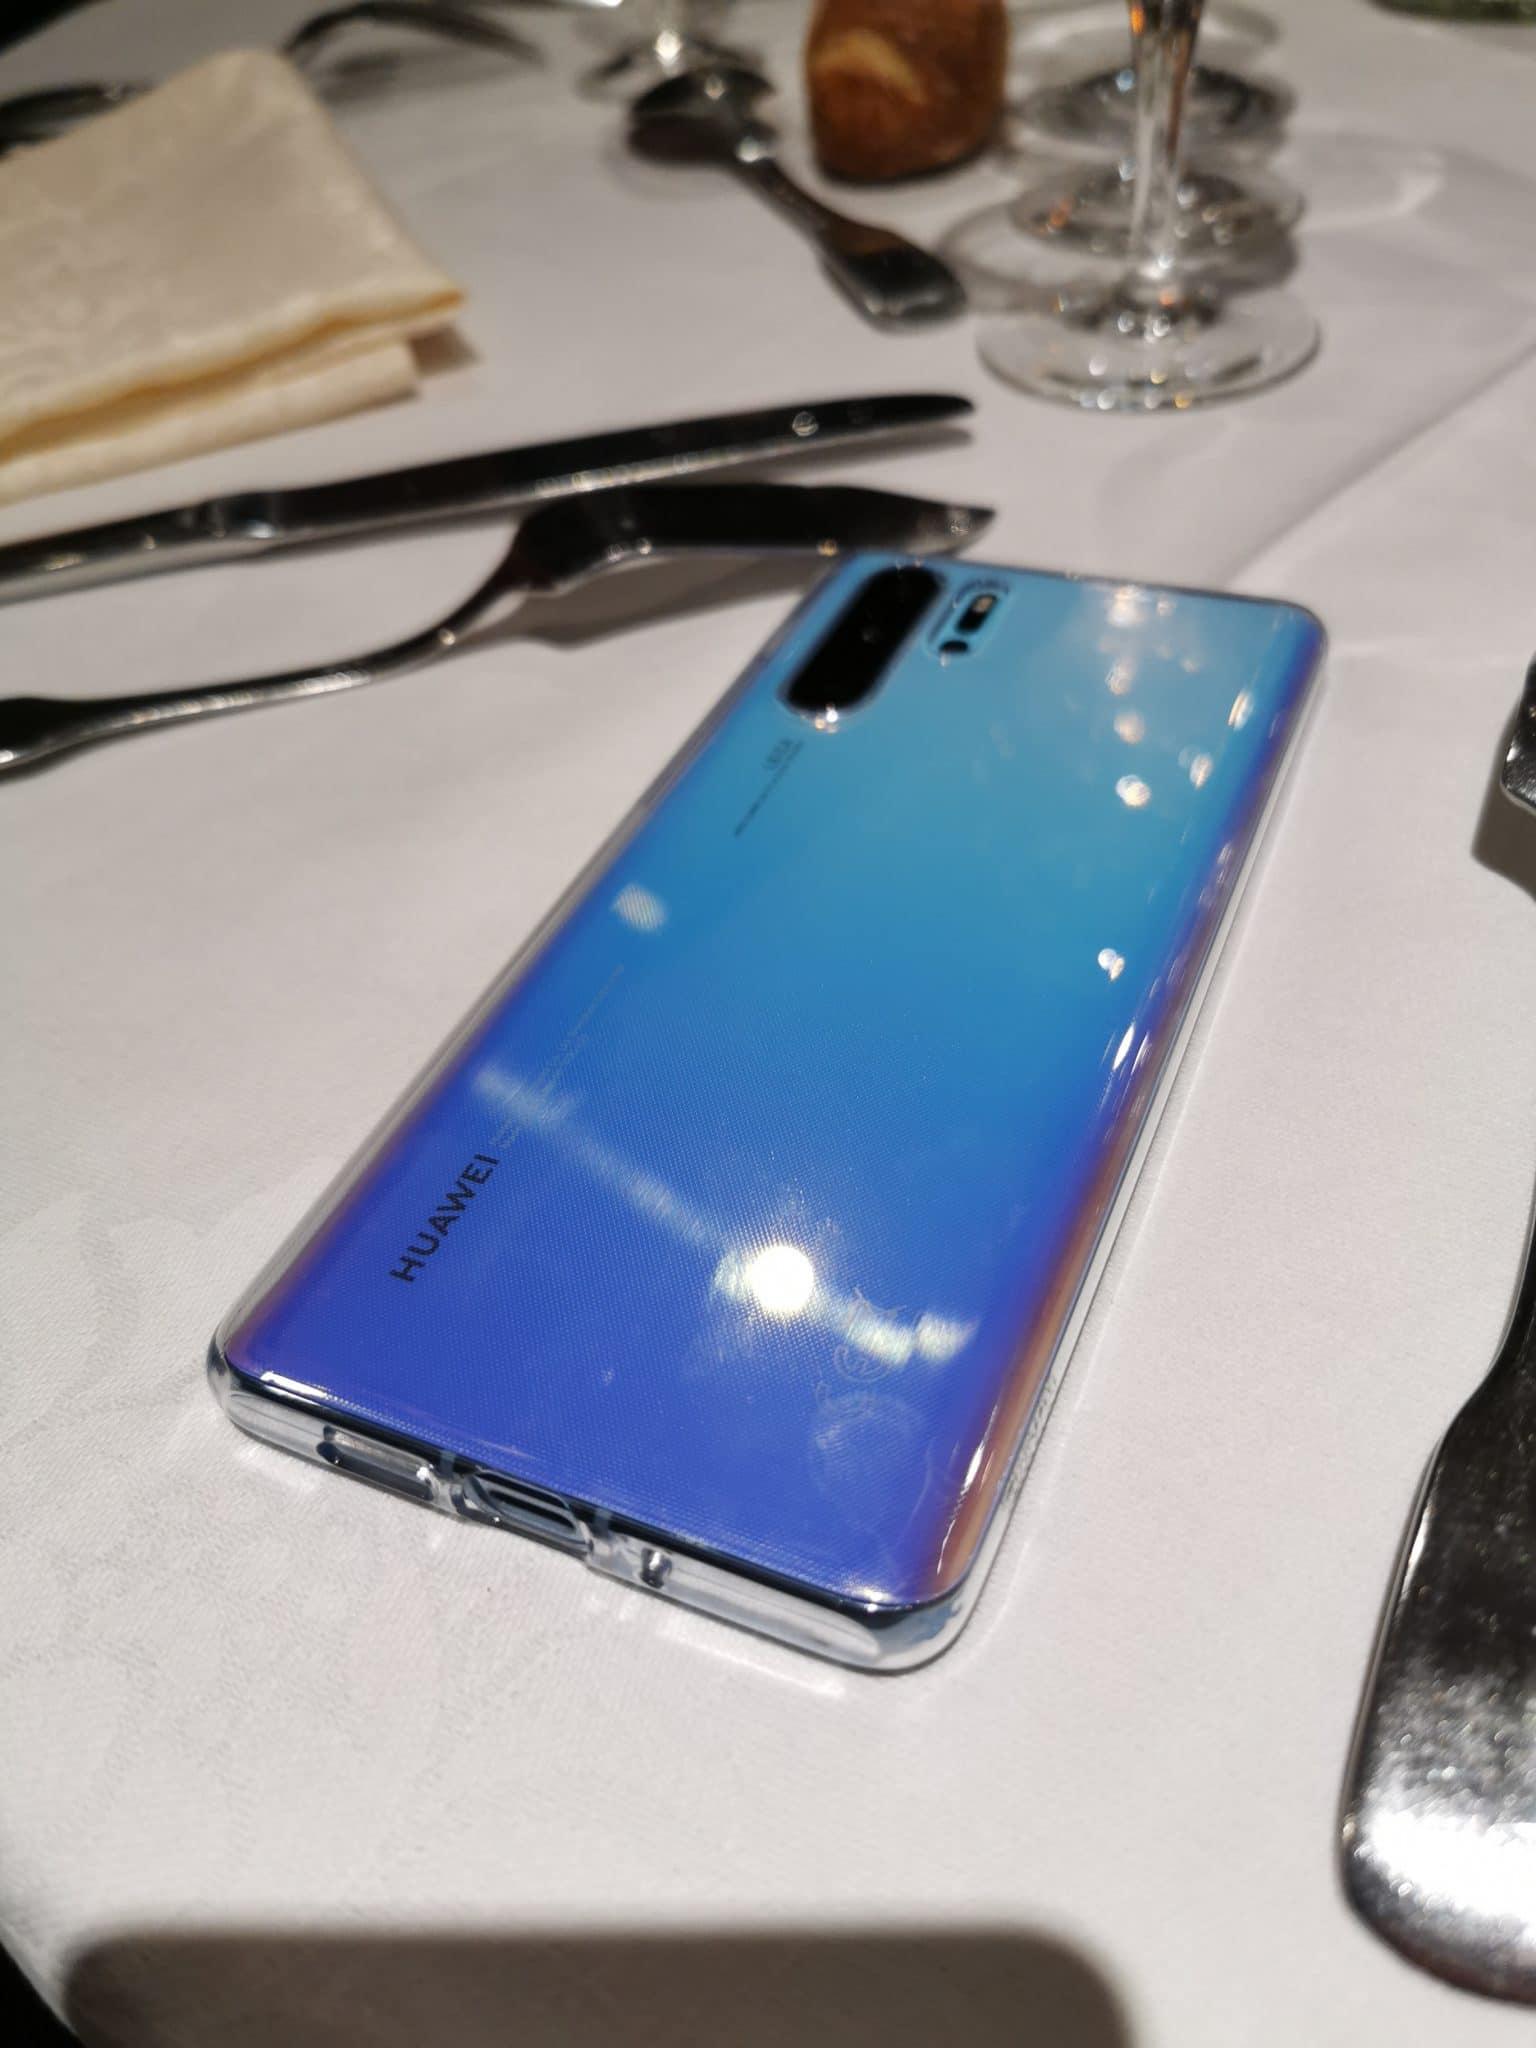 Huawei P30 Pro Kamera-Test und Kurz-Review.